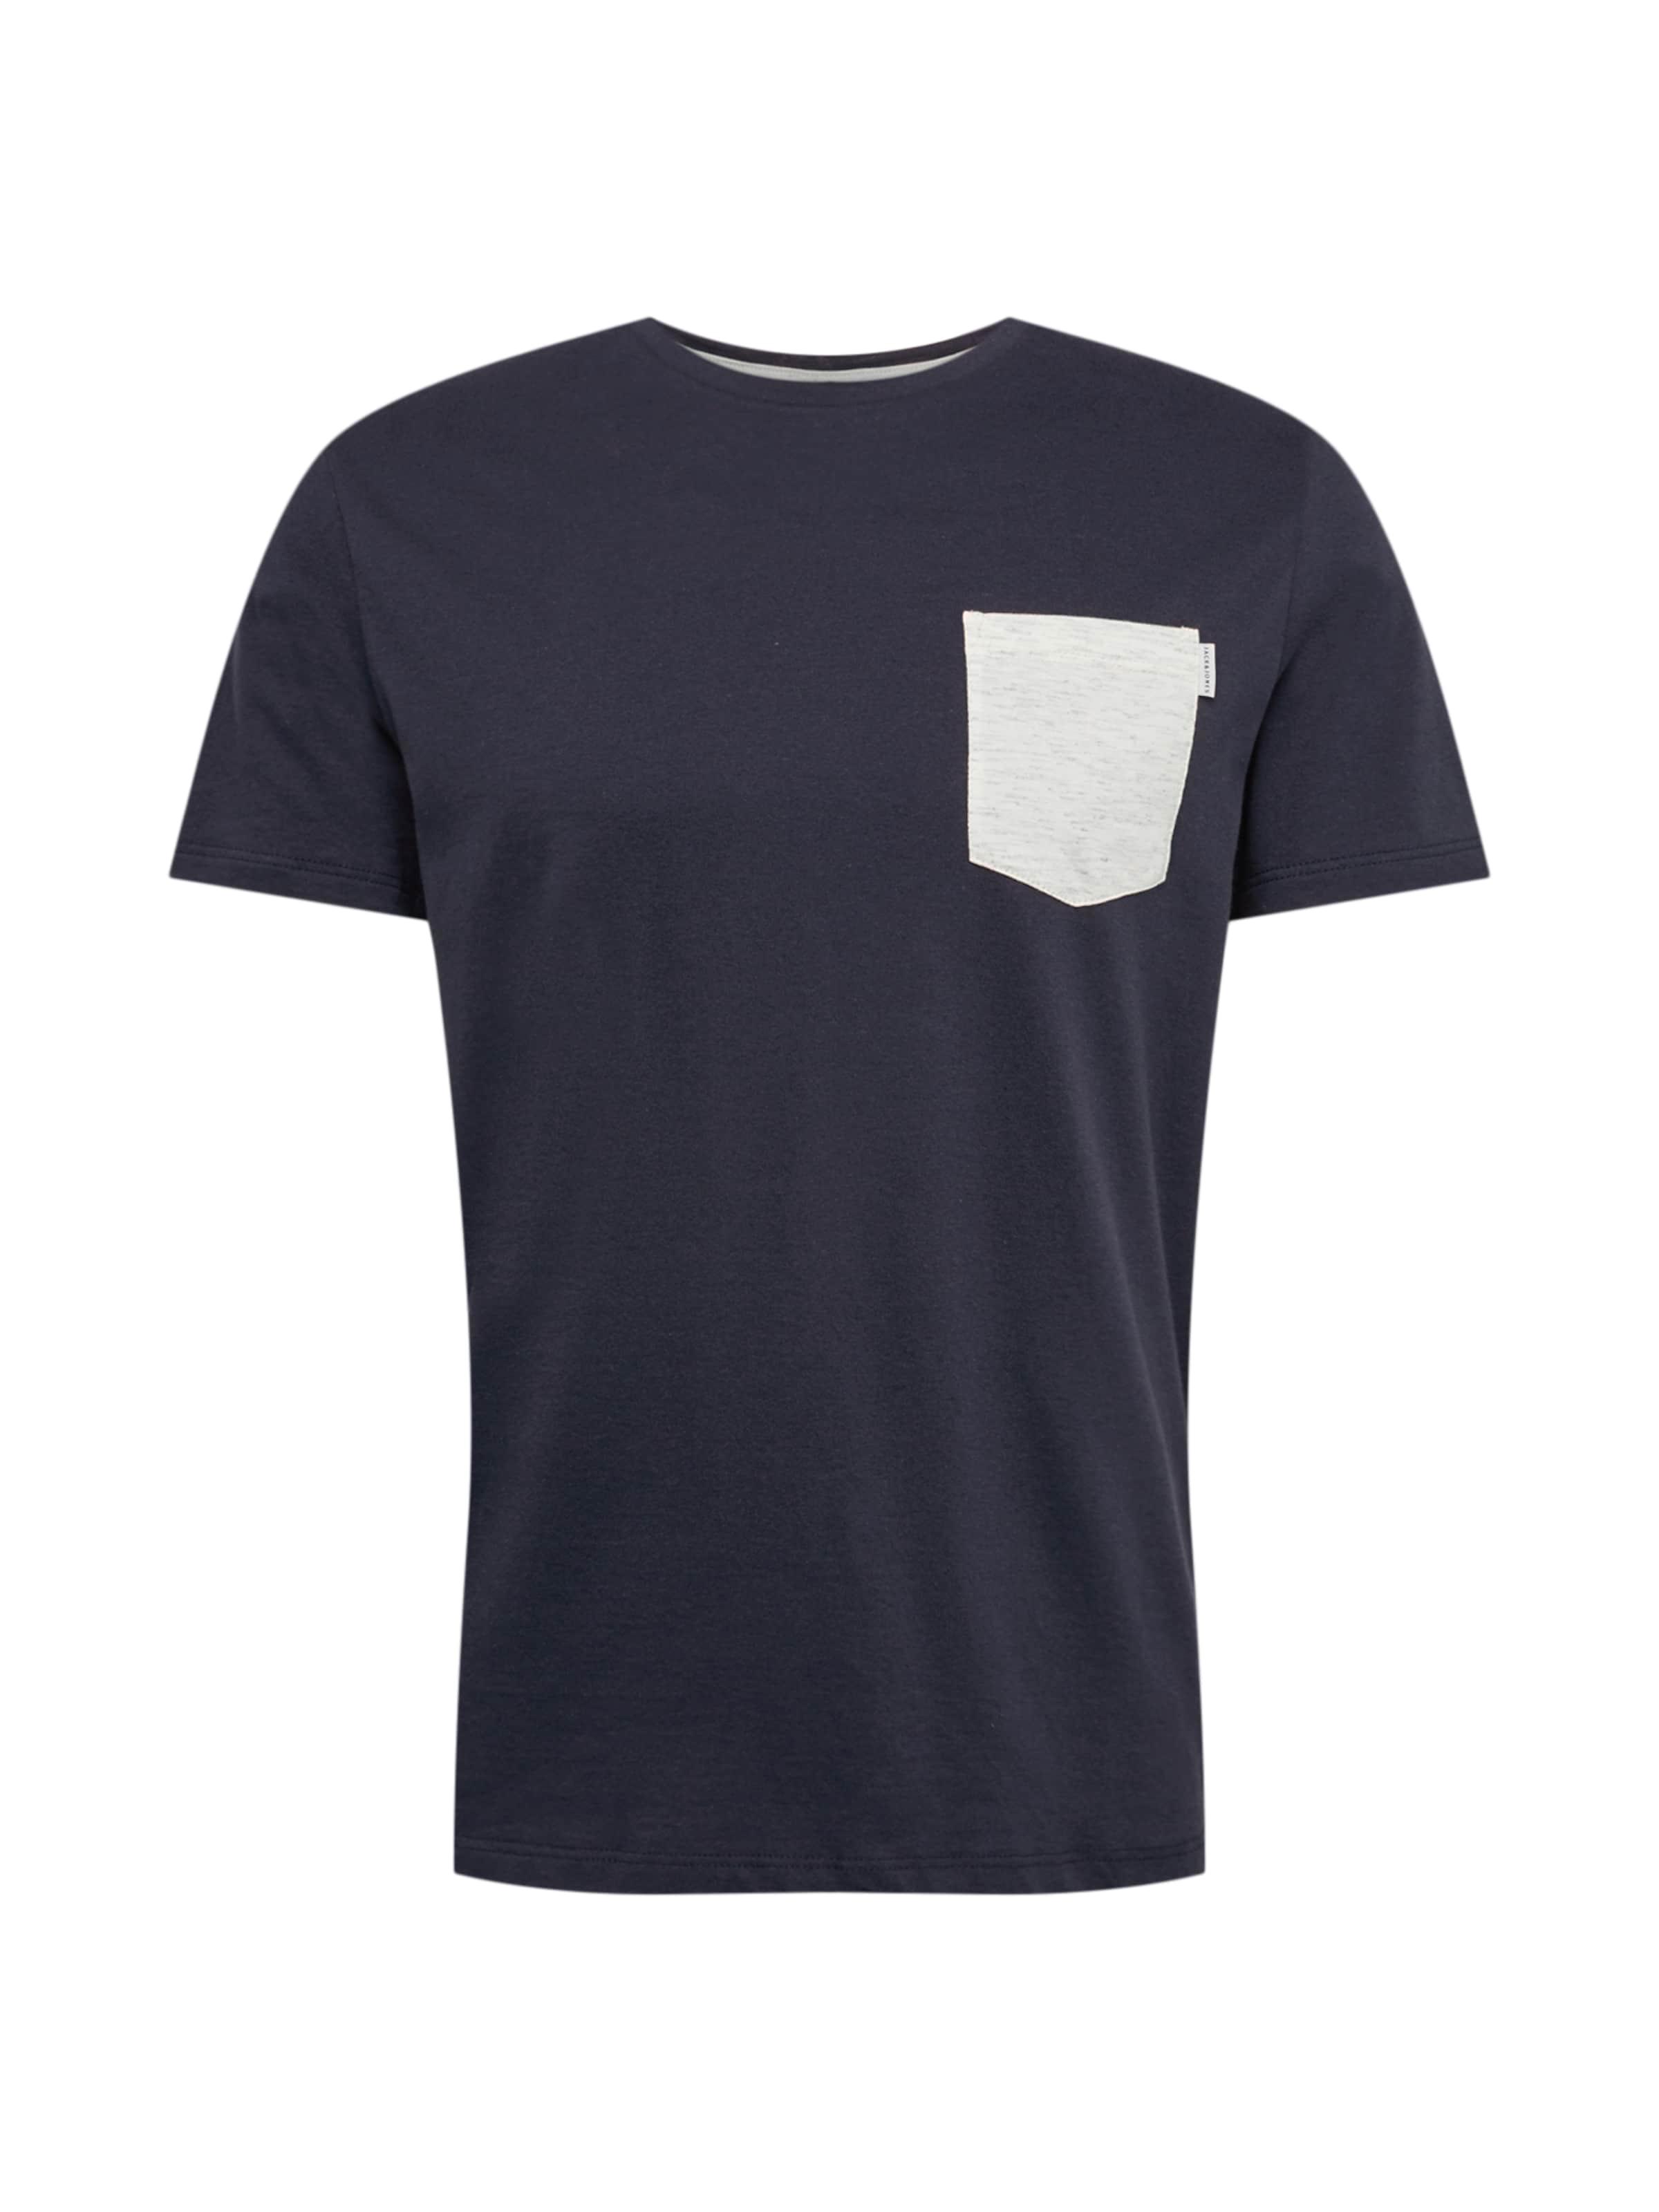 'jcoboston' T Jackamp; En shirt Rouge Jones 9eDWYEH2I